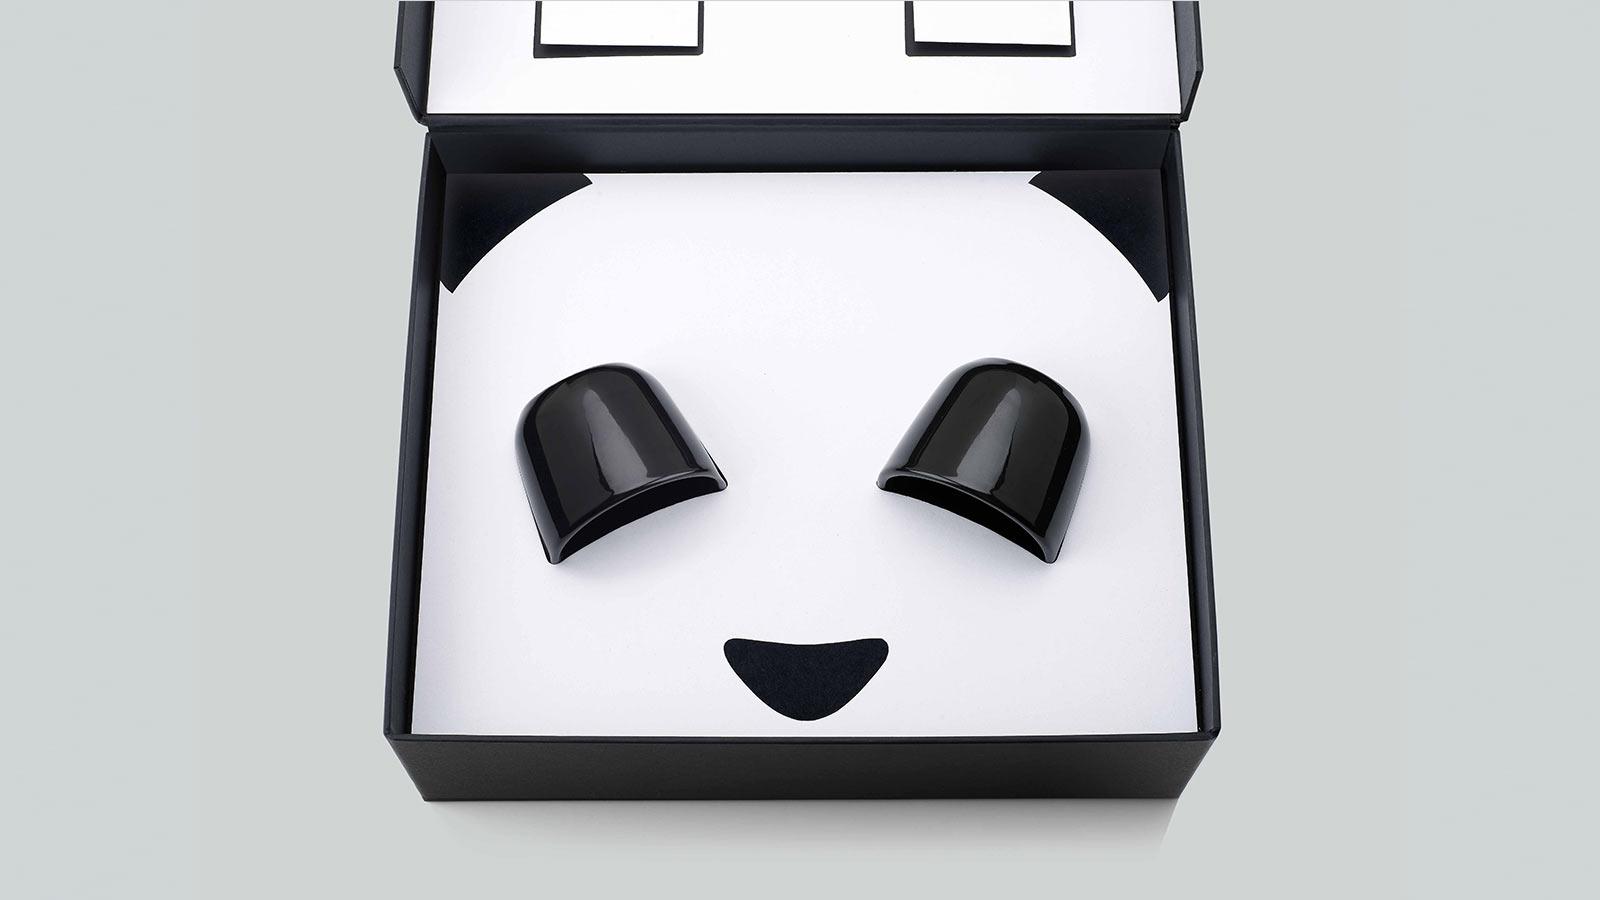 Toronto Zoo | Panda Cups Direct Mail | Advertising, Brand Strategy, Branding, Design